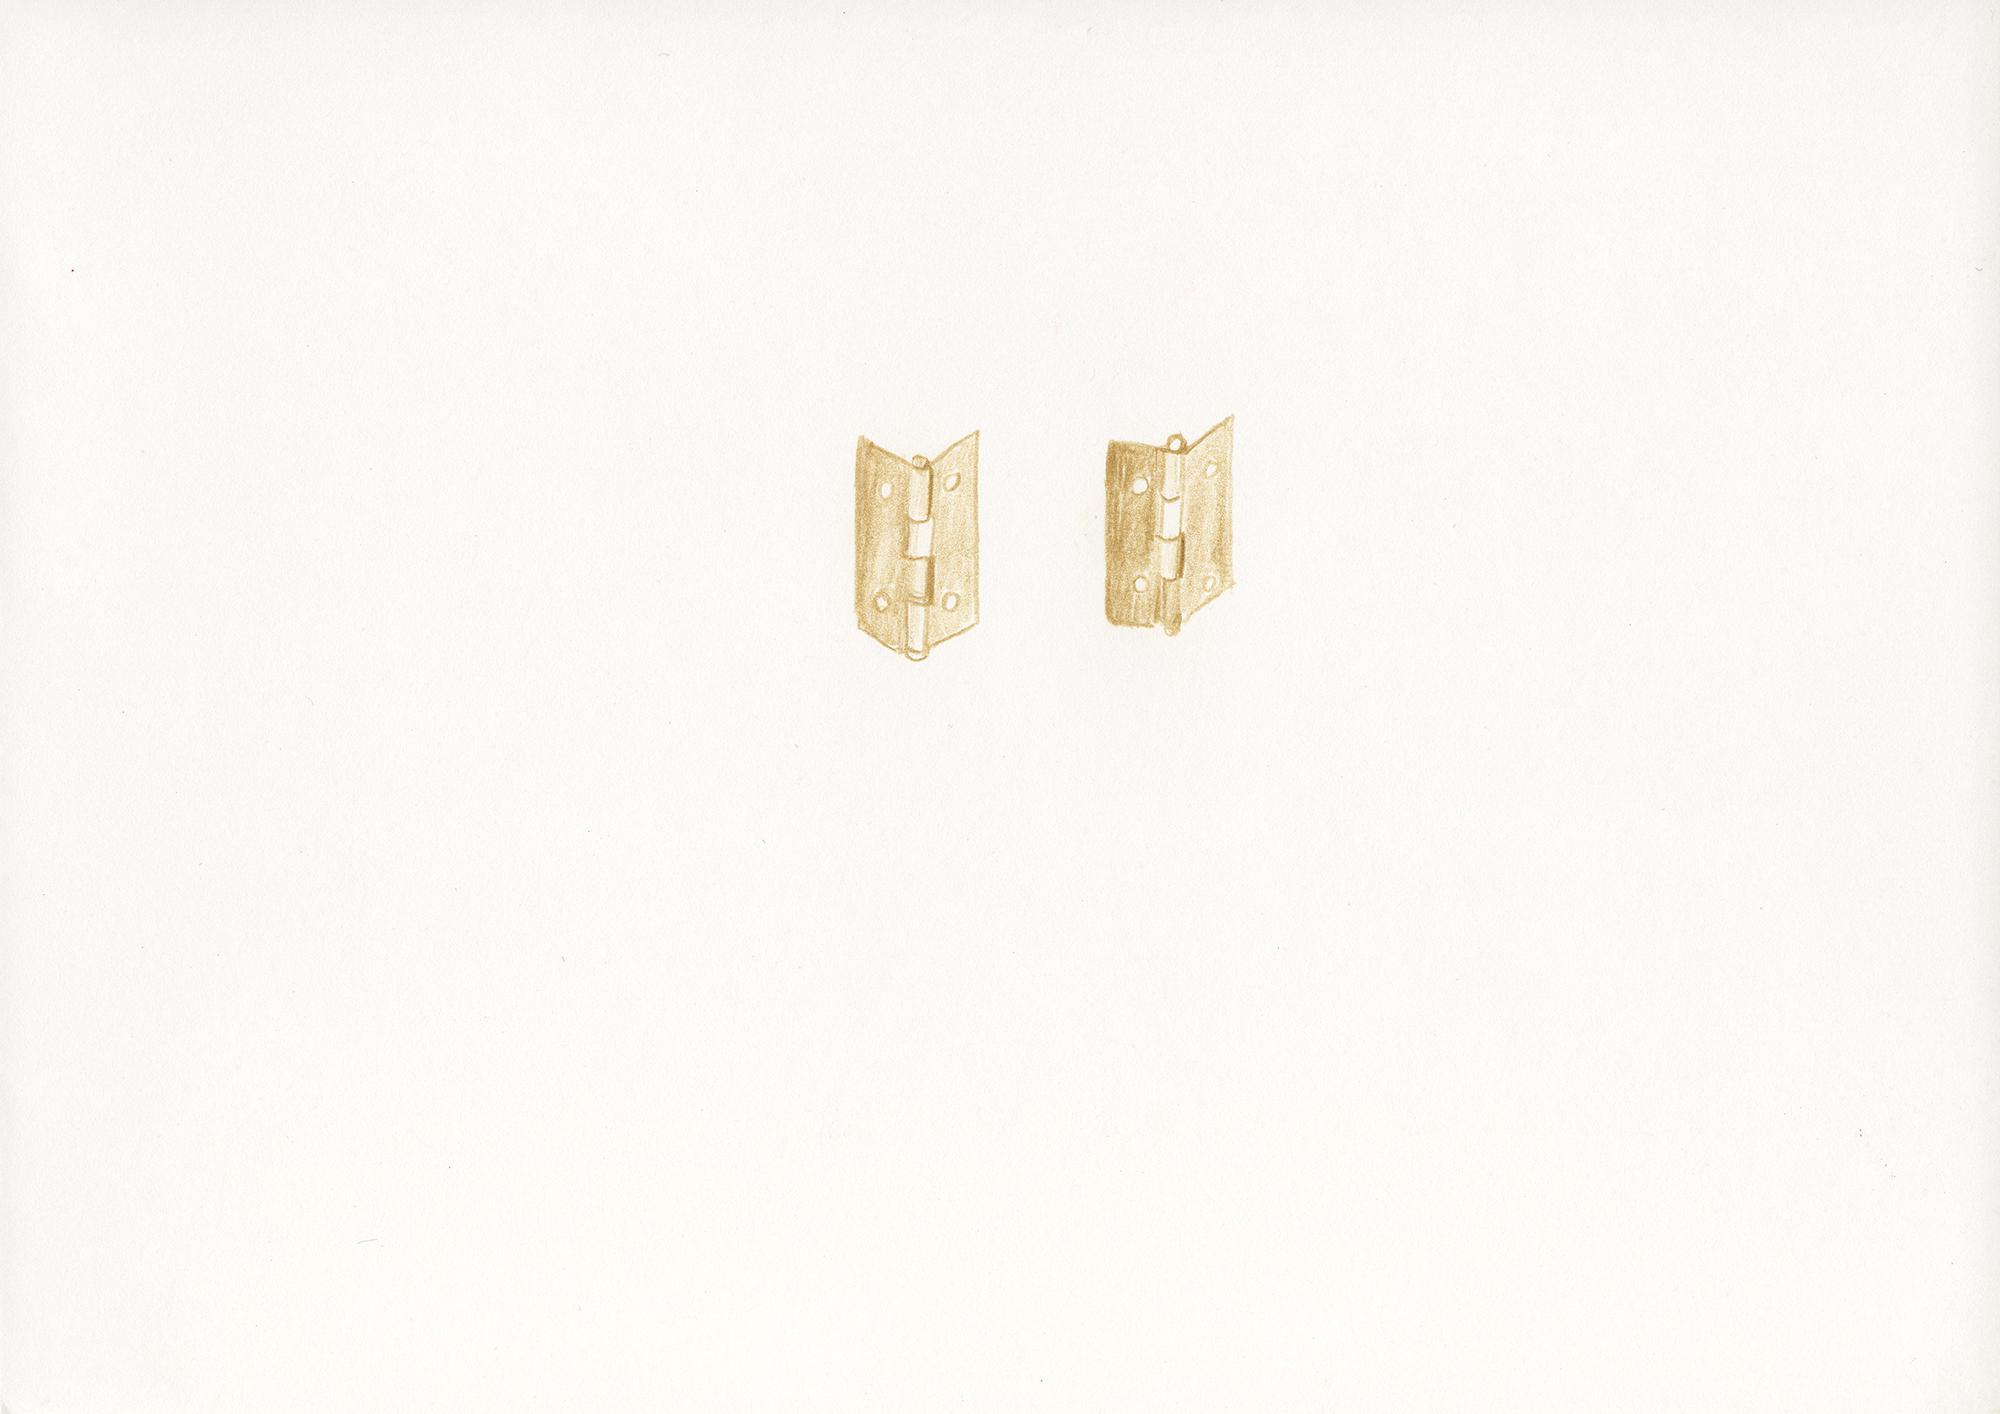 Untitled, 2013, color pencil on paper, 21 x 29,7 cm